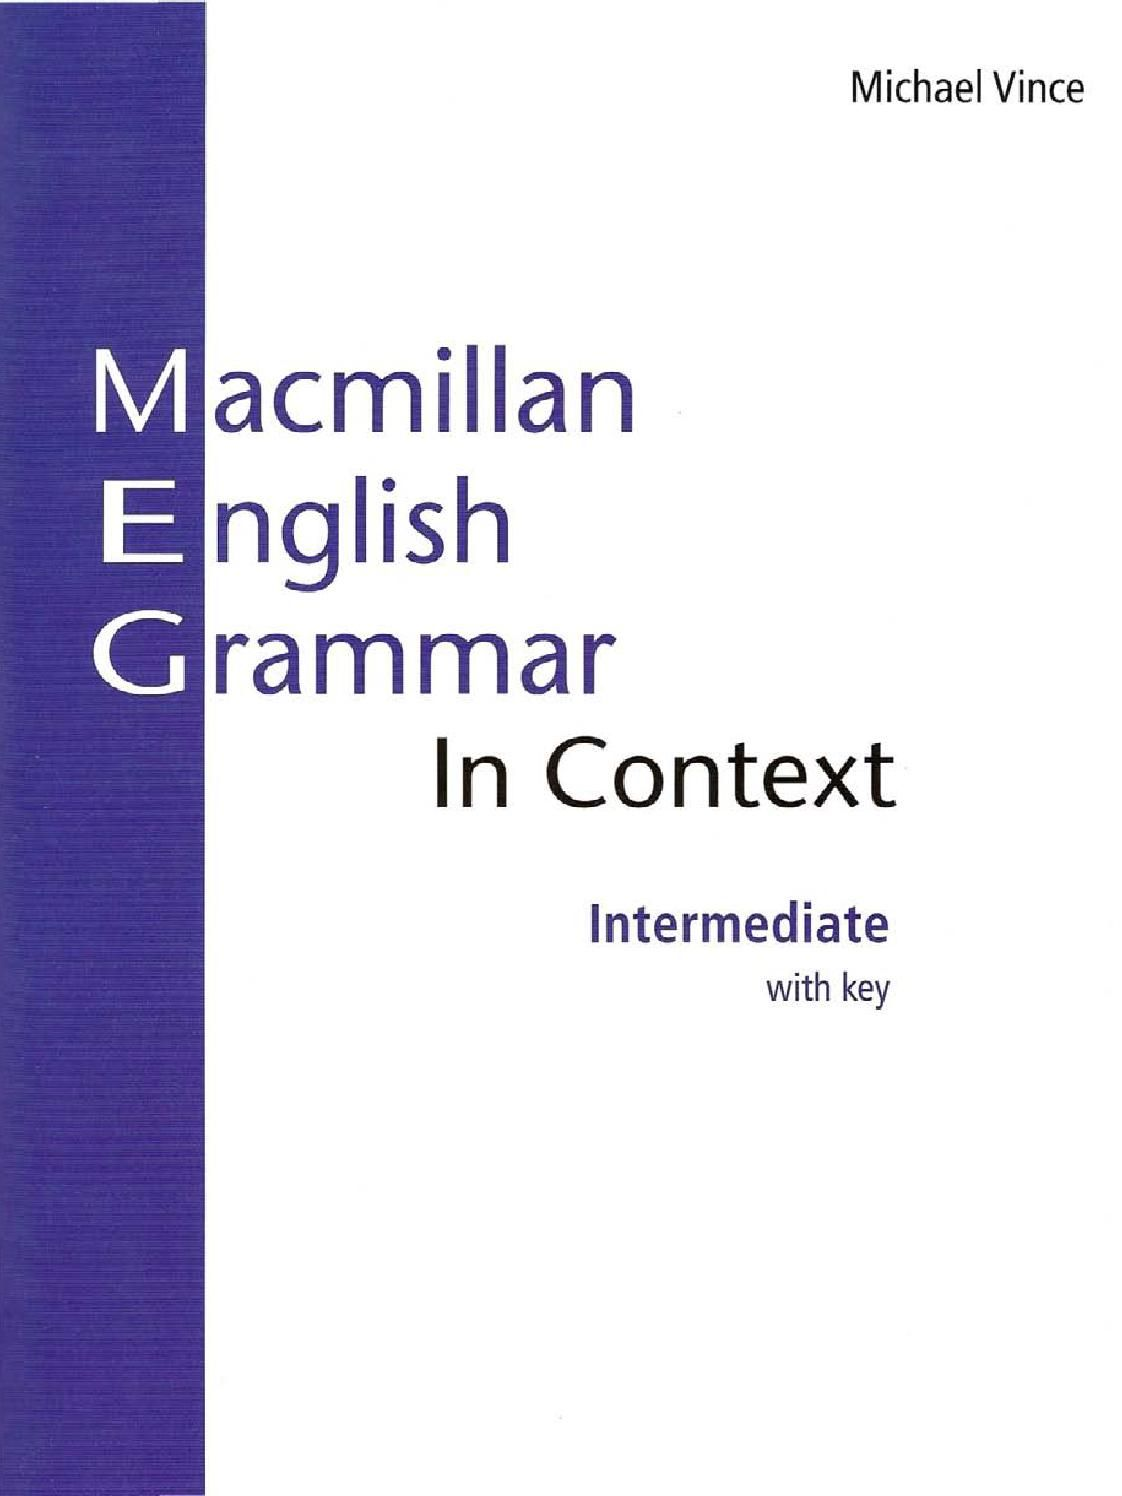 Macmillan english grammar context advanced download image macmillan english grammar in context intermediate by joao kanabrava macmillan english grammar in context intermediate by fandeluxe Image collections